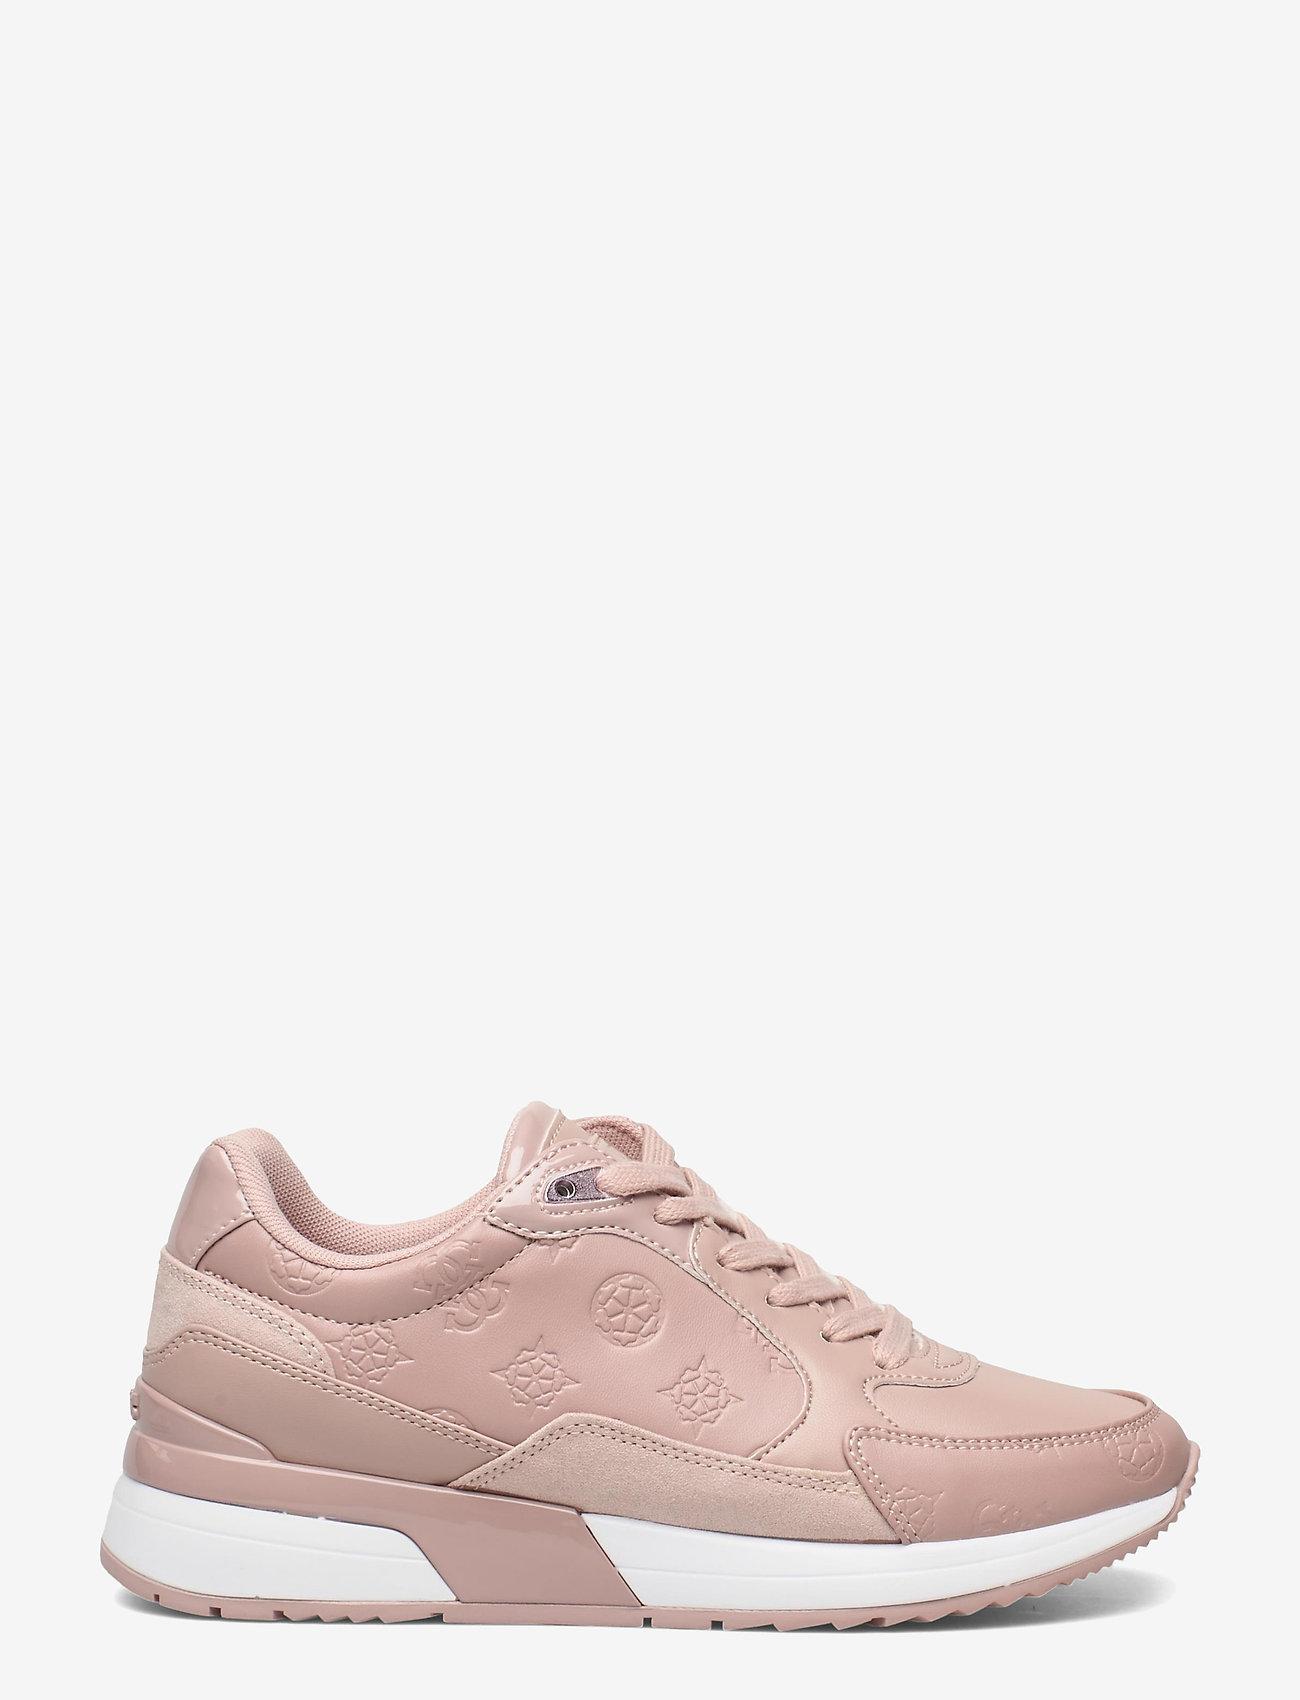 GUESS - MOXEA2/ACTIVE LADY/LEATHER LIK - låga sneakers - blush - 1